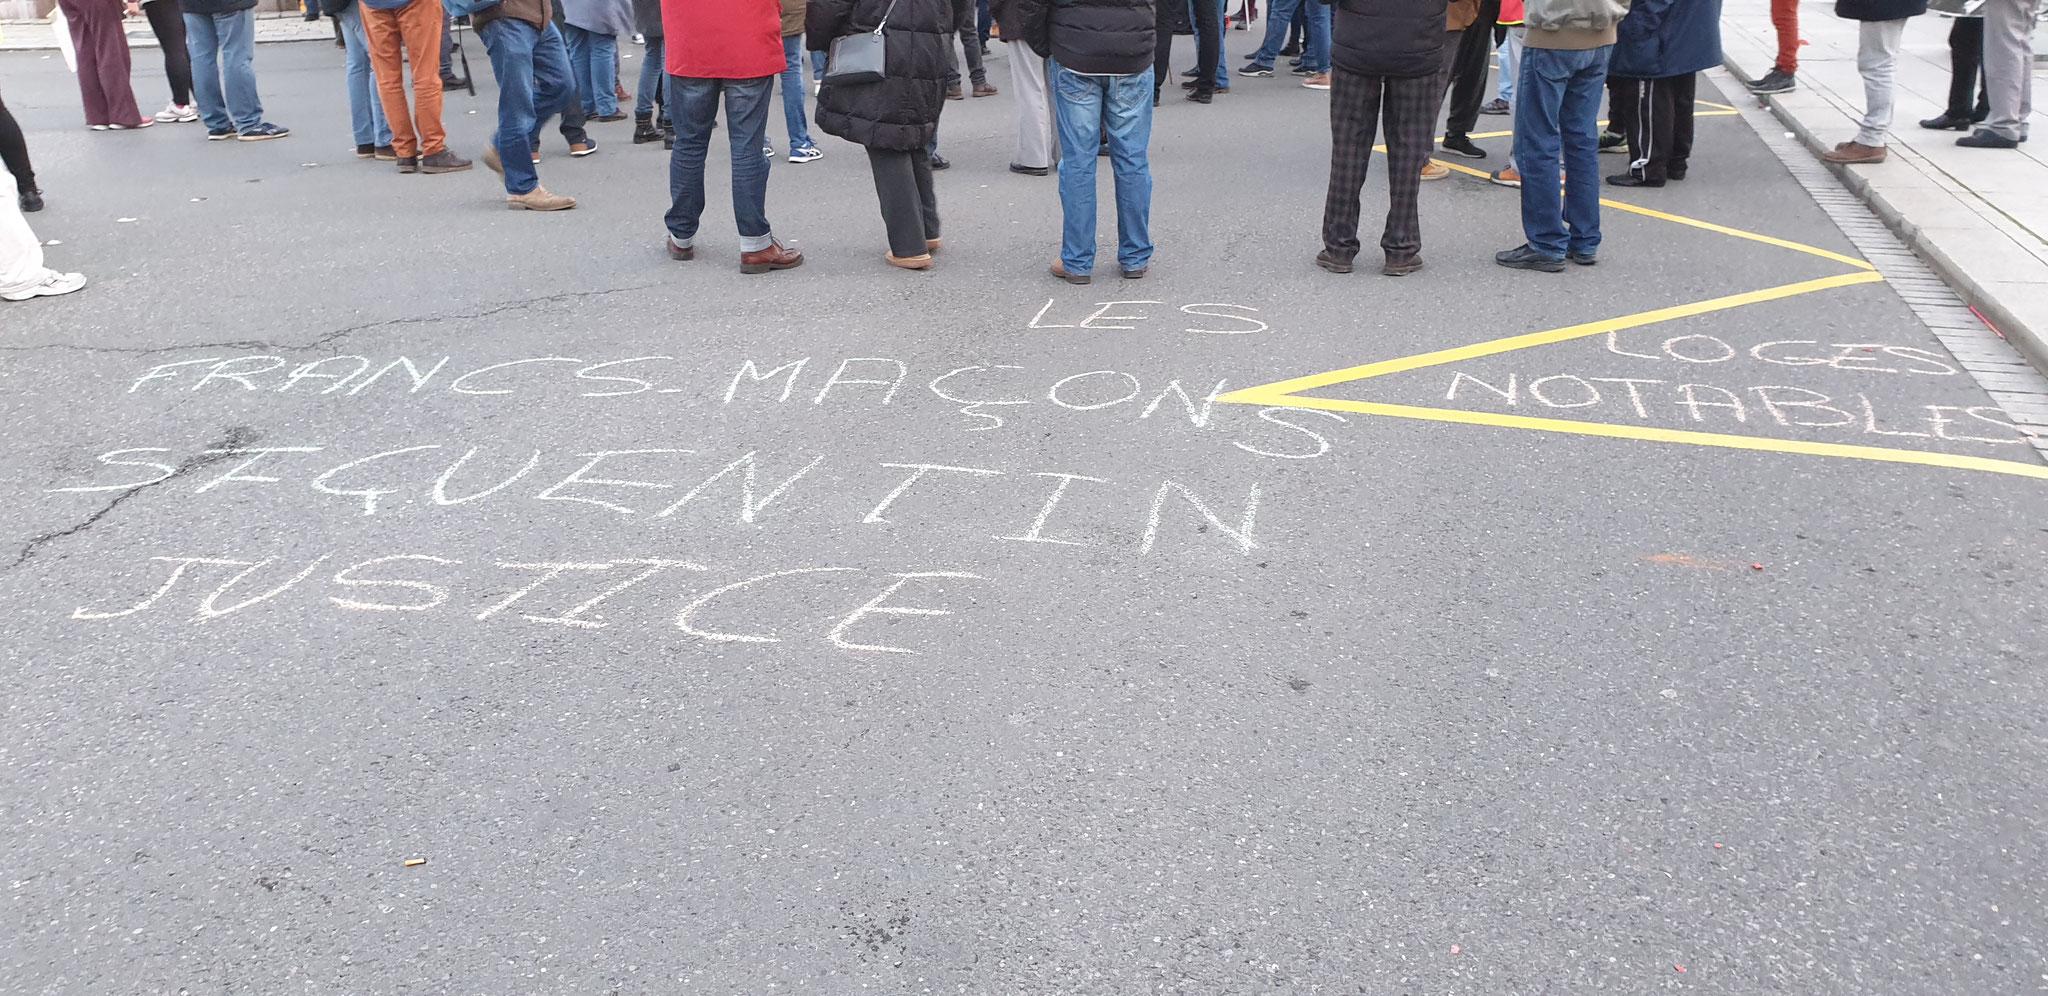 Manifestation du 06 Février 2020 à Saint-Quentin (02) #StopCorruptionStop #StopViolences #StopMafia www.jenesuispasunchien.fr www.jesuisvictime.fr www.jesuispatrick.fr